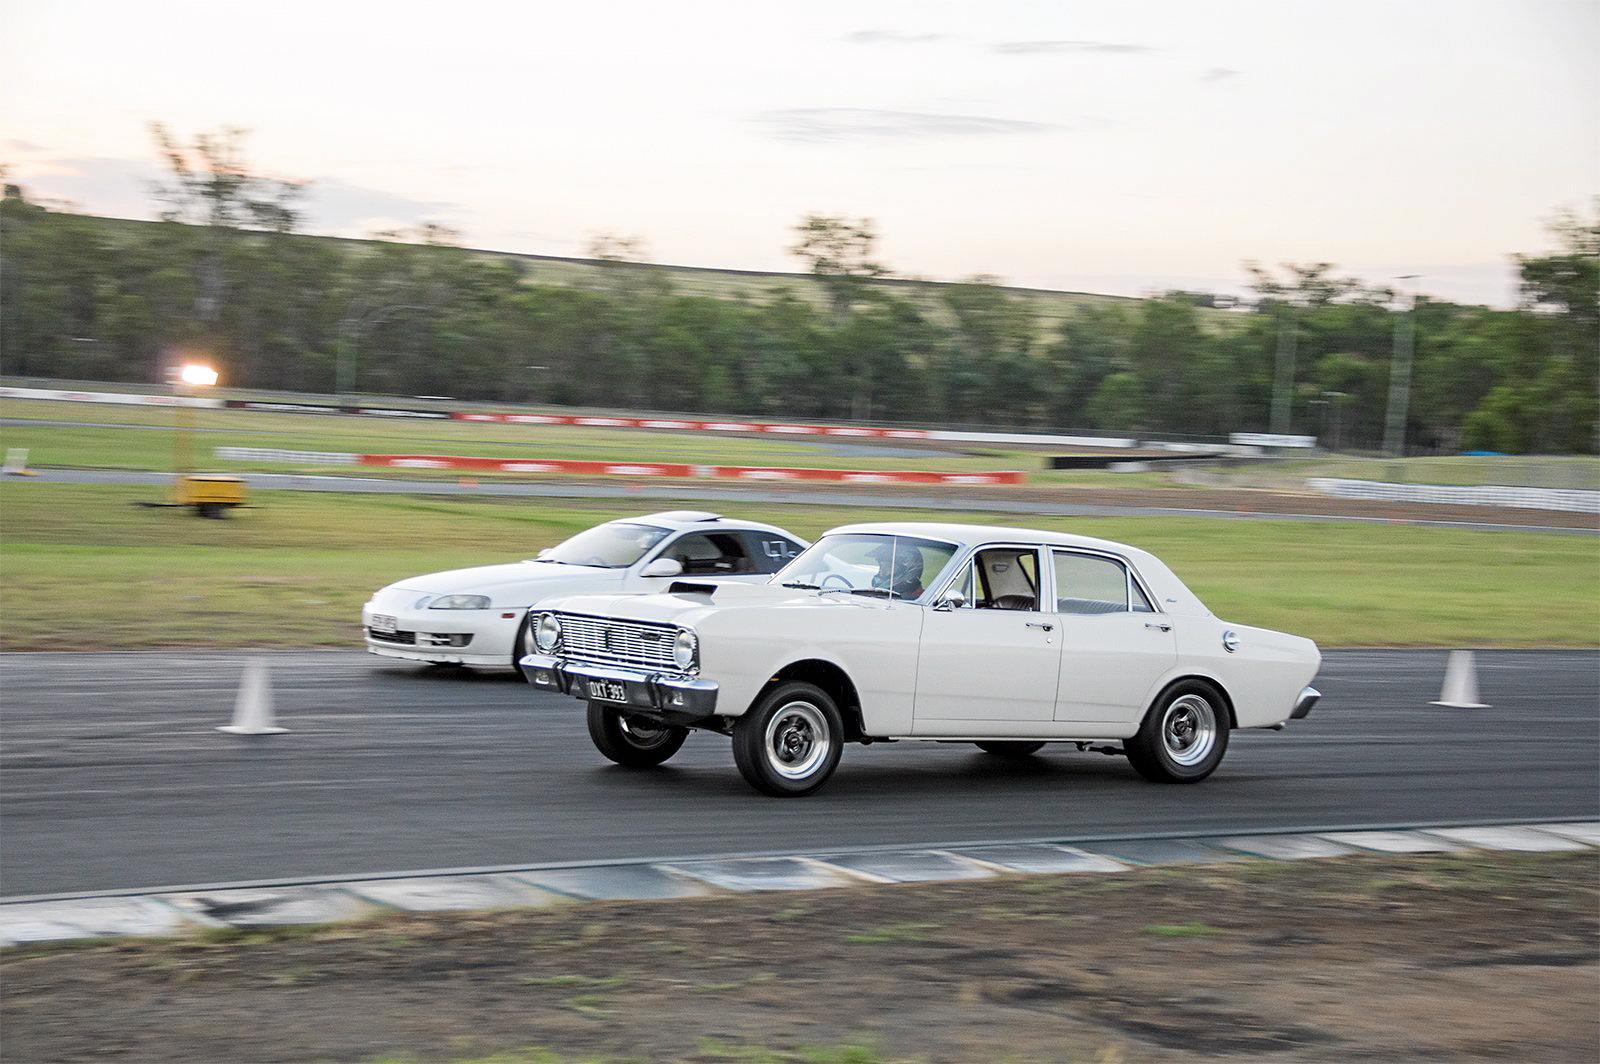 Saturday night roll racing at Queensland Raceway.